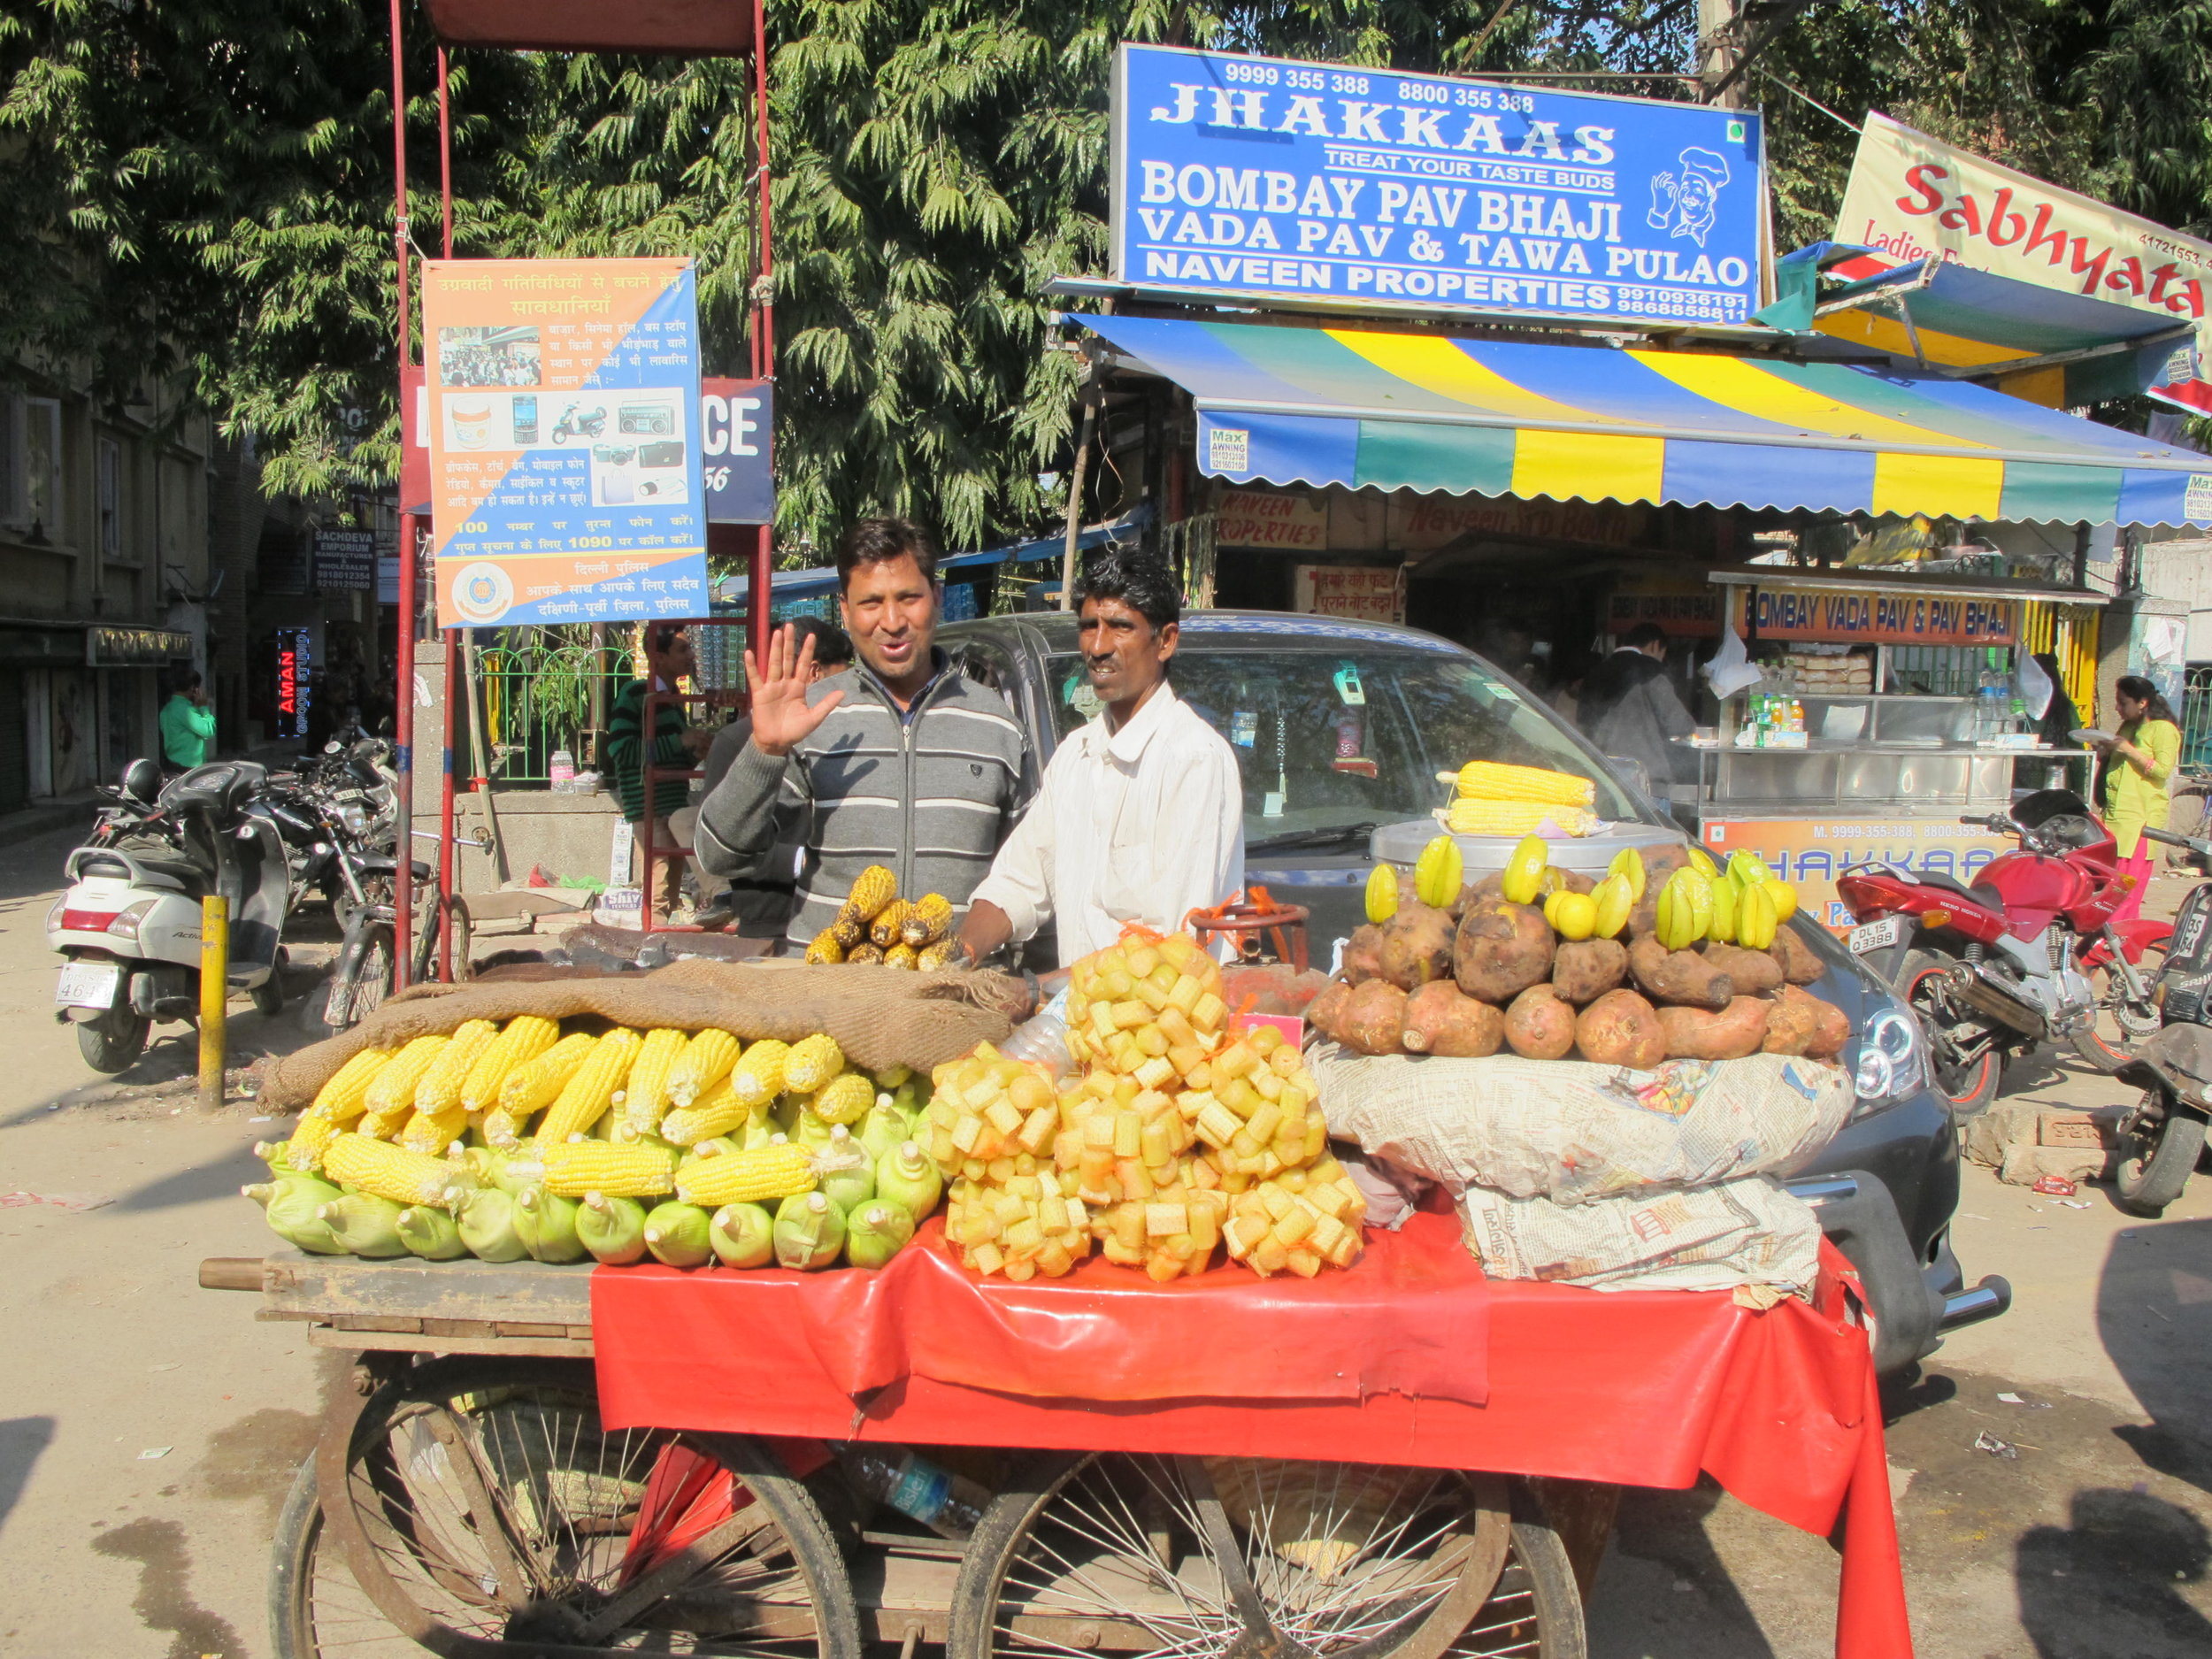 Talin Spring travel Spring Finn and Co Old Delhi food vendors India Delhi street photography street food